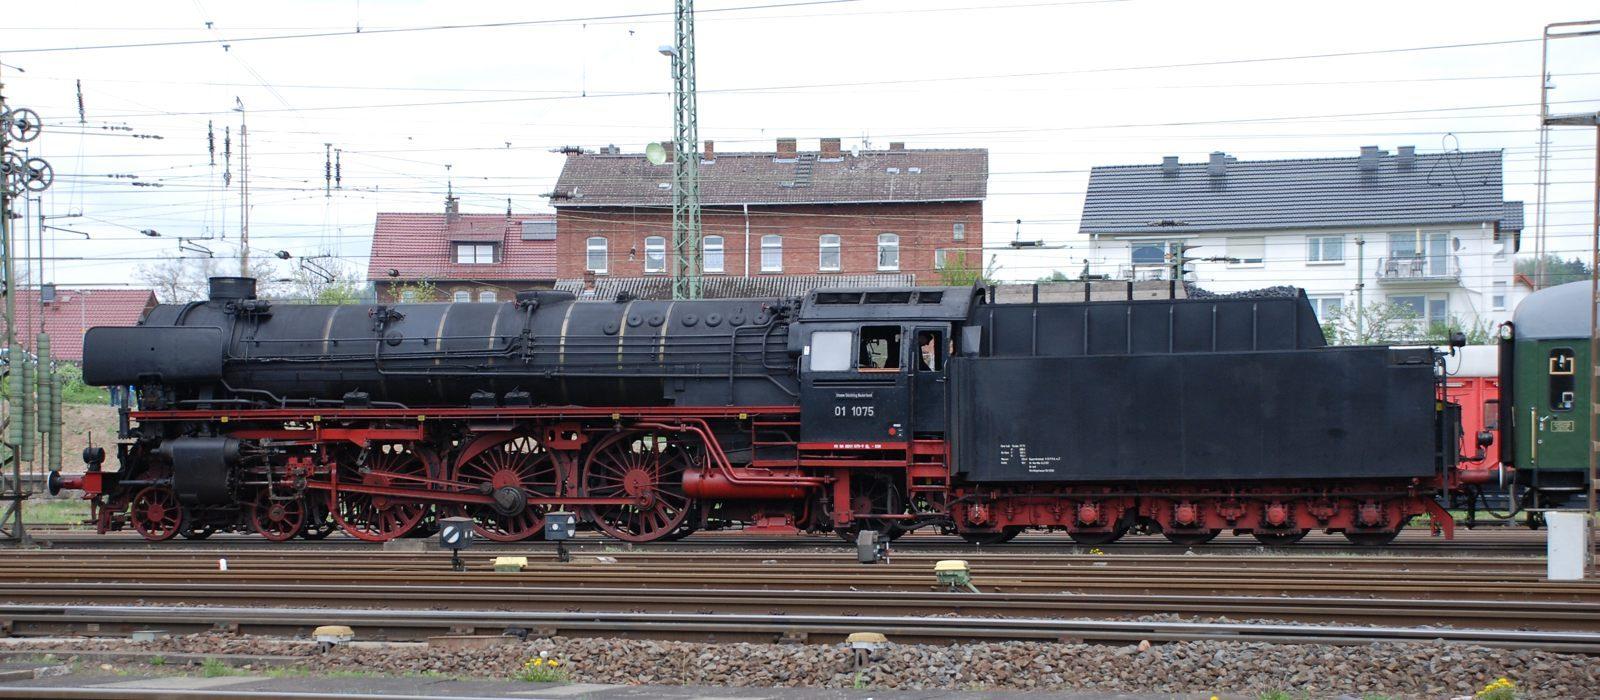 2010Bebra06_1600